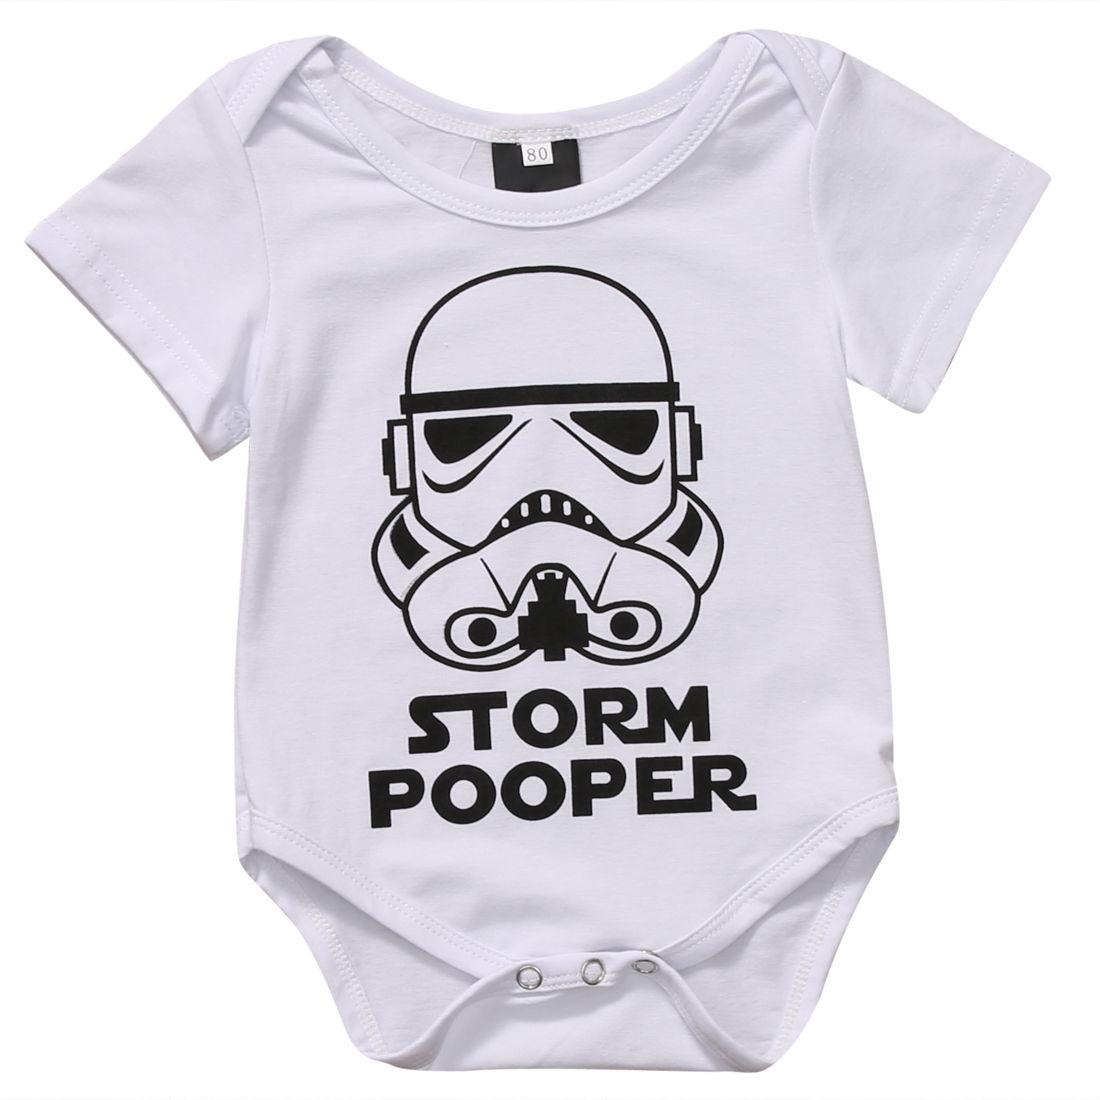 0-18M Infant Newborn Baby Boy Girl Storm Pooper Short Sleeve Cotton Romper Jumpsuit Playsuit Tops Summer Clothes